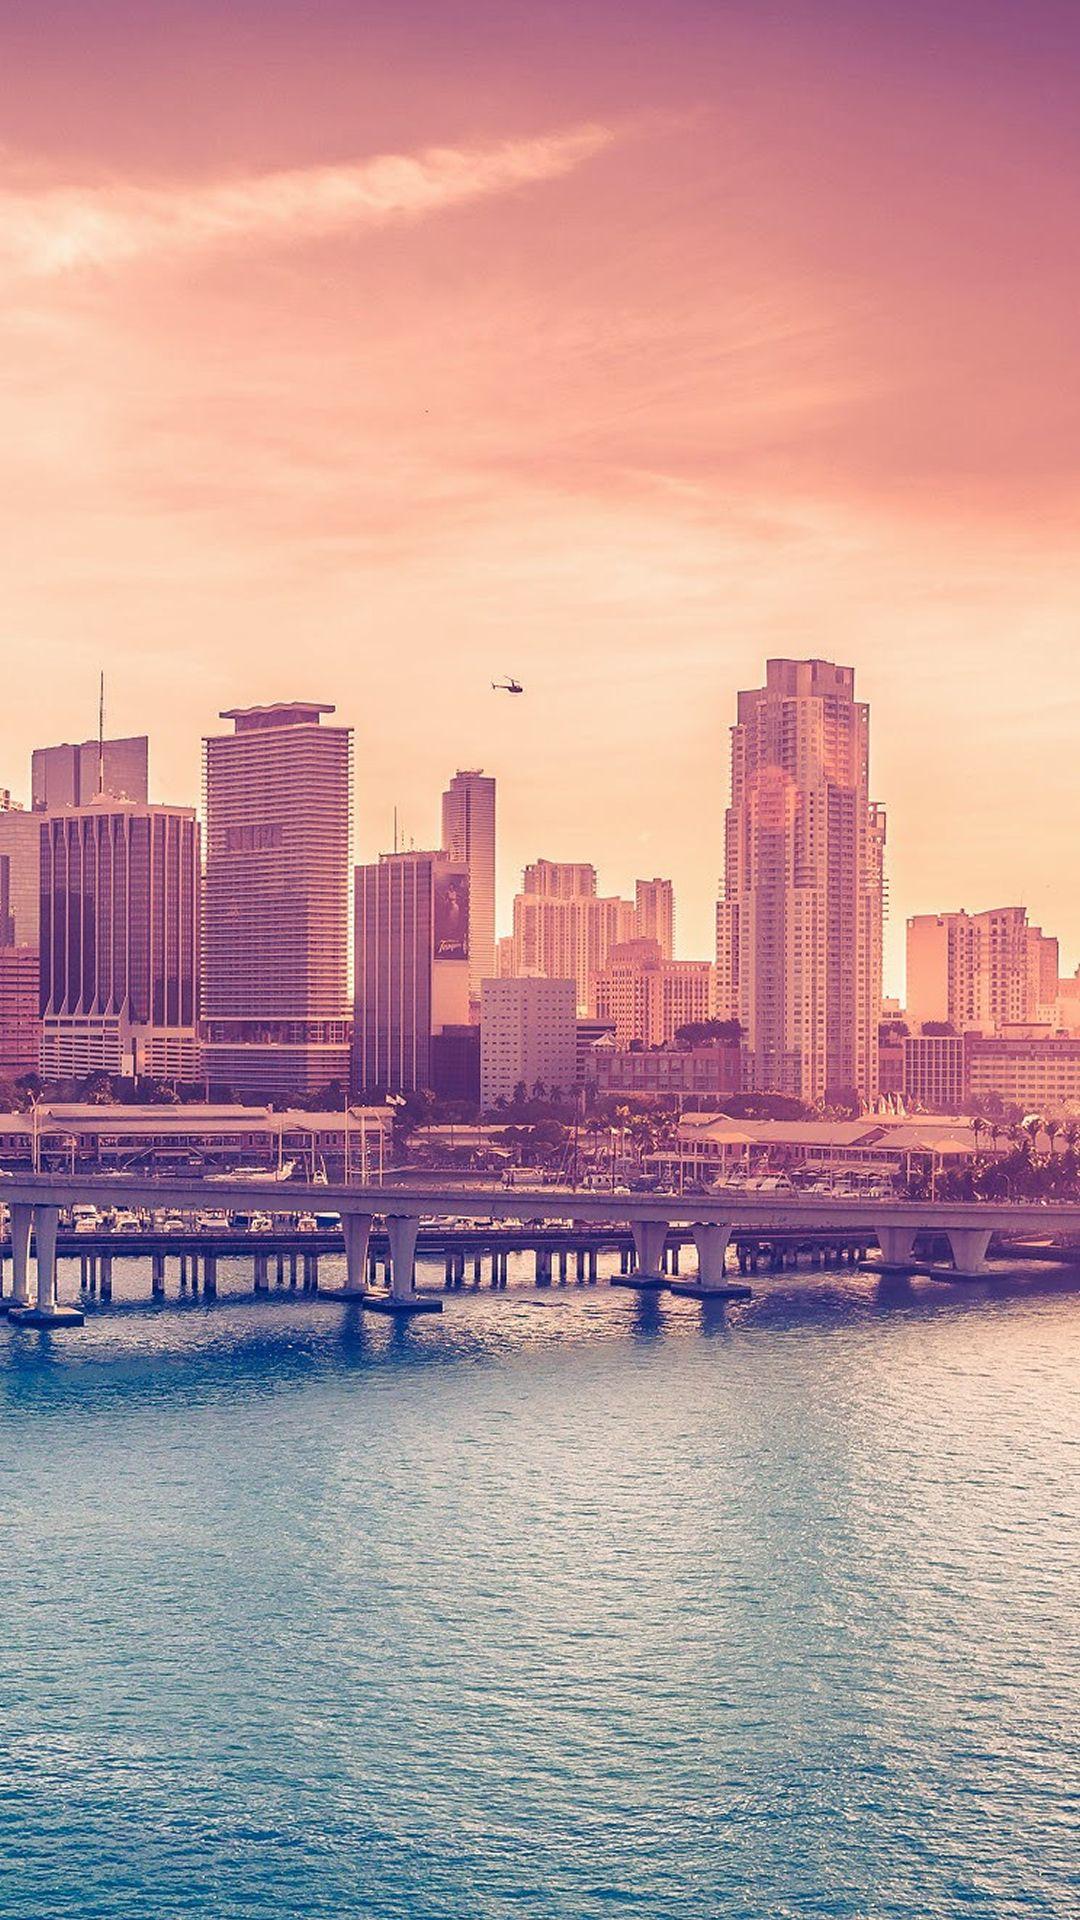 City Skyline Bridge Sunset Ios8 Iphone 6 Plus Wallpaper Sunset Wallpaper City Wallpaper City Skyline